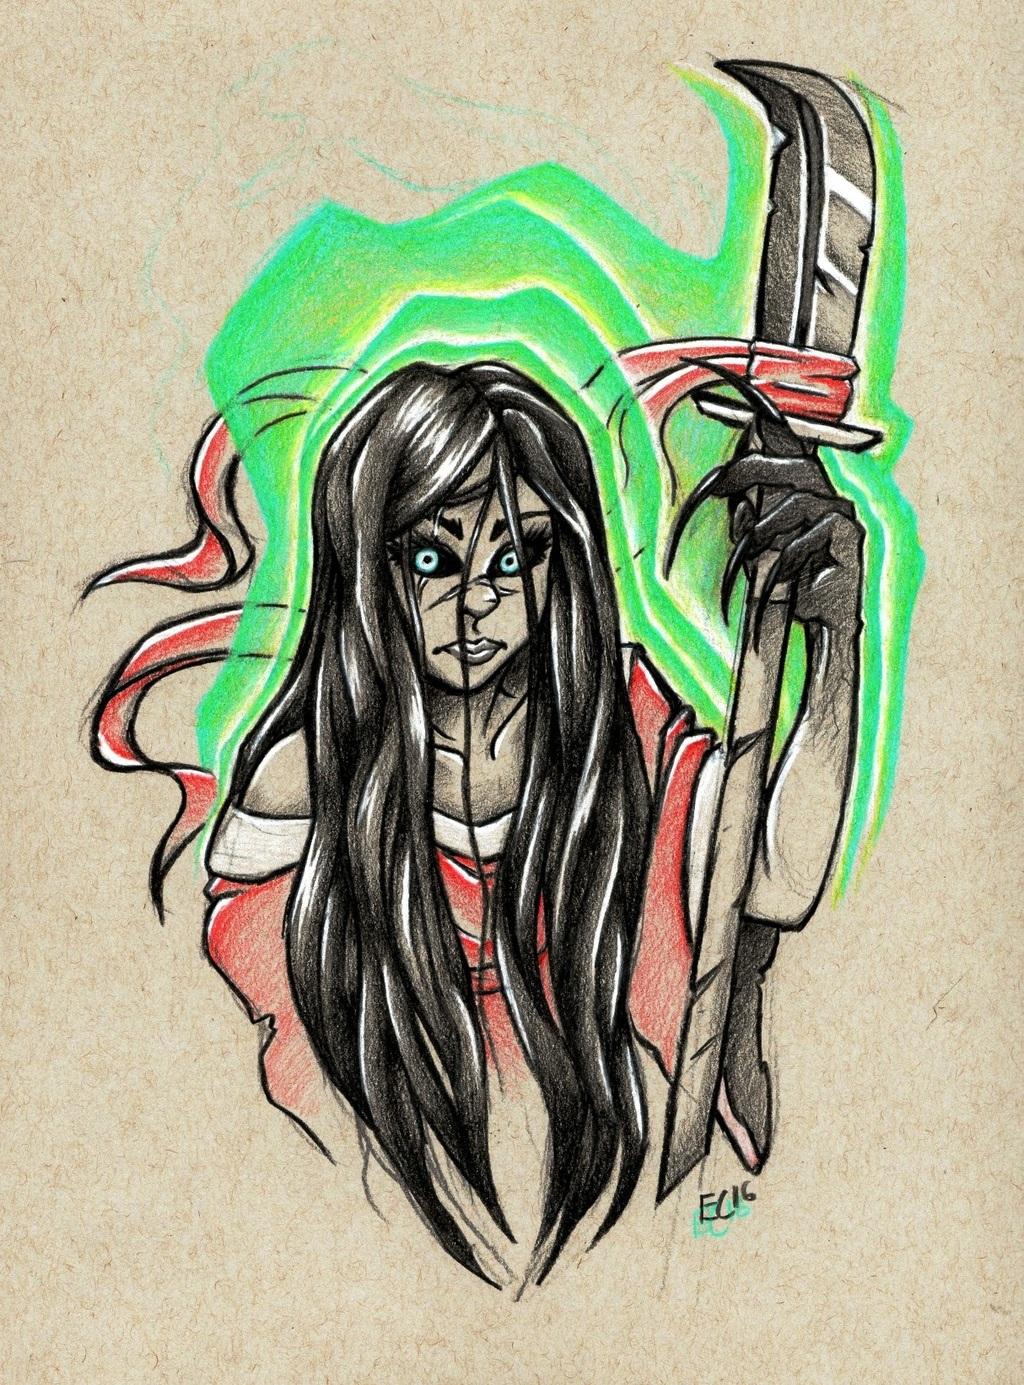 Most recent image: Hisako - Killer Instinct